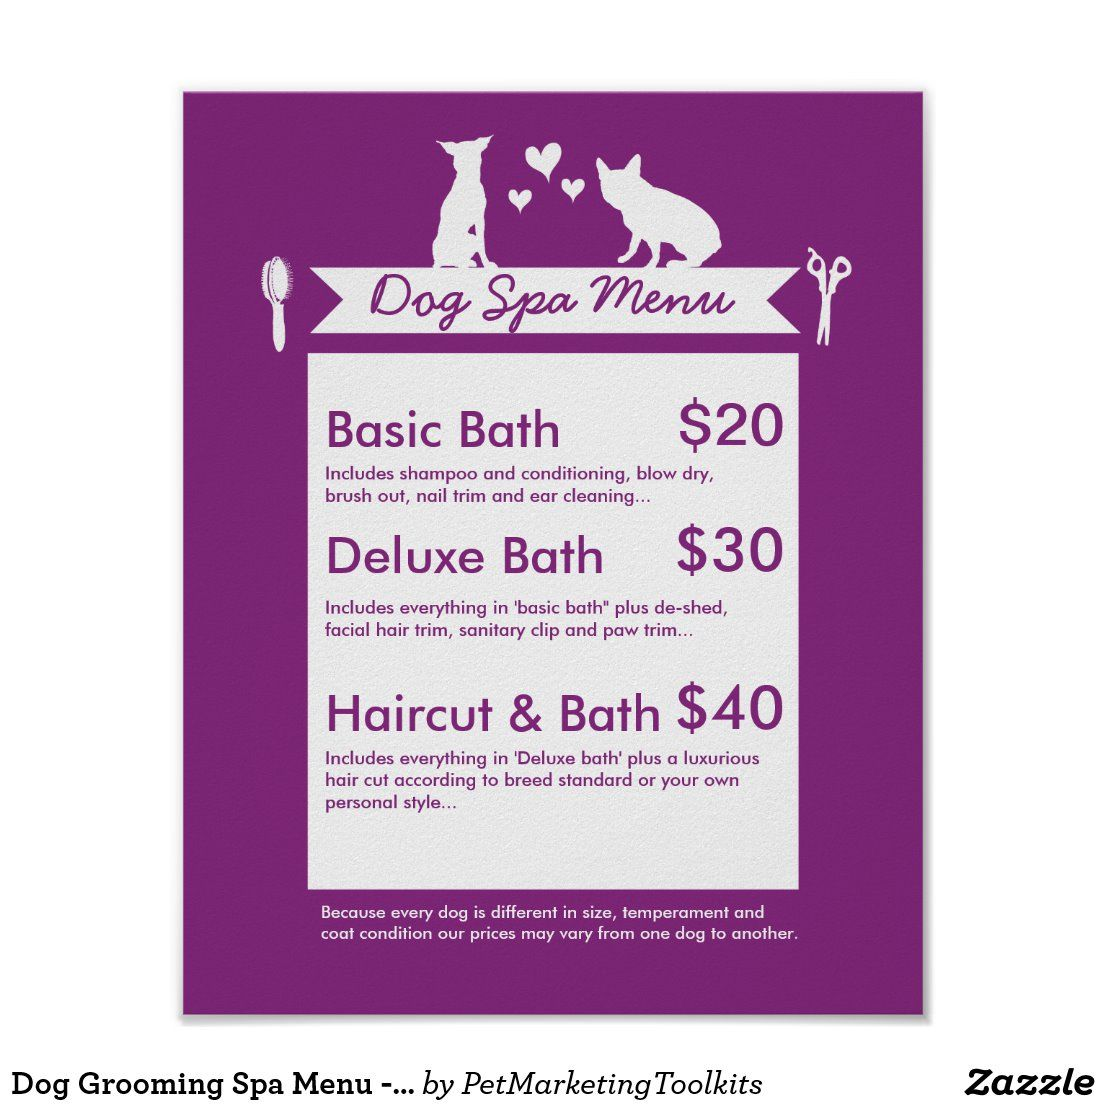 Dog grooming spa menu personalizable poster